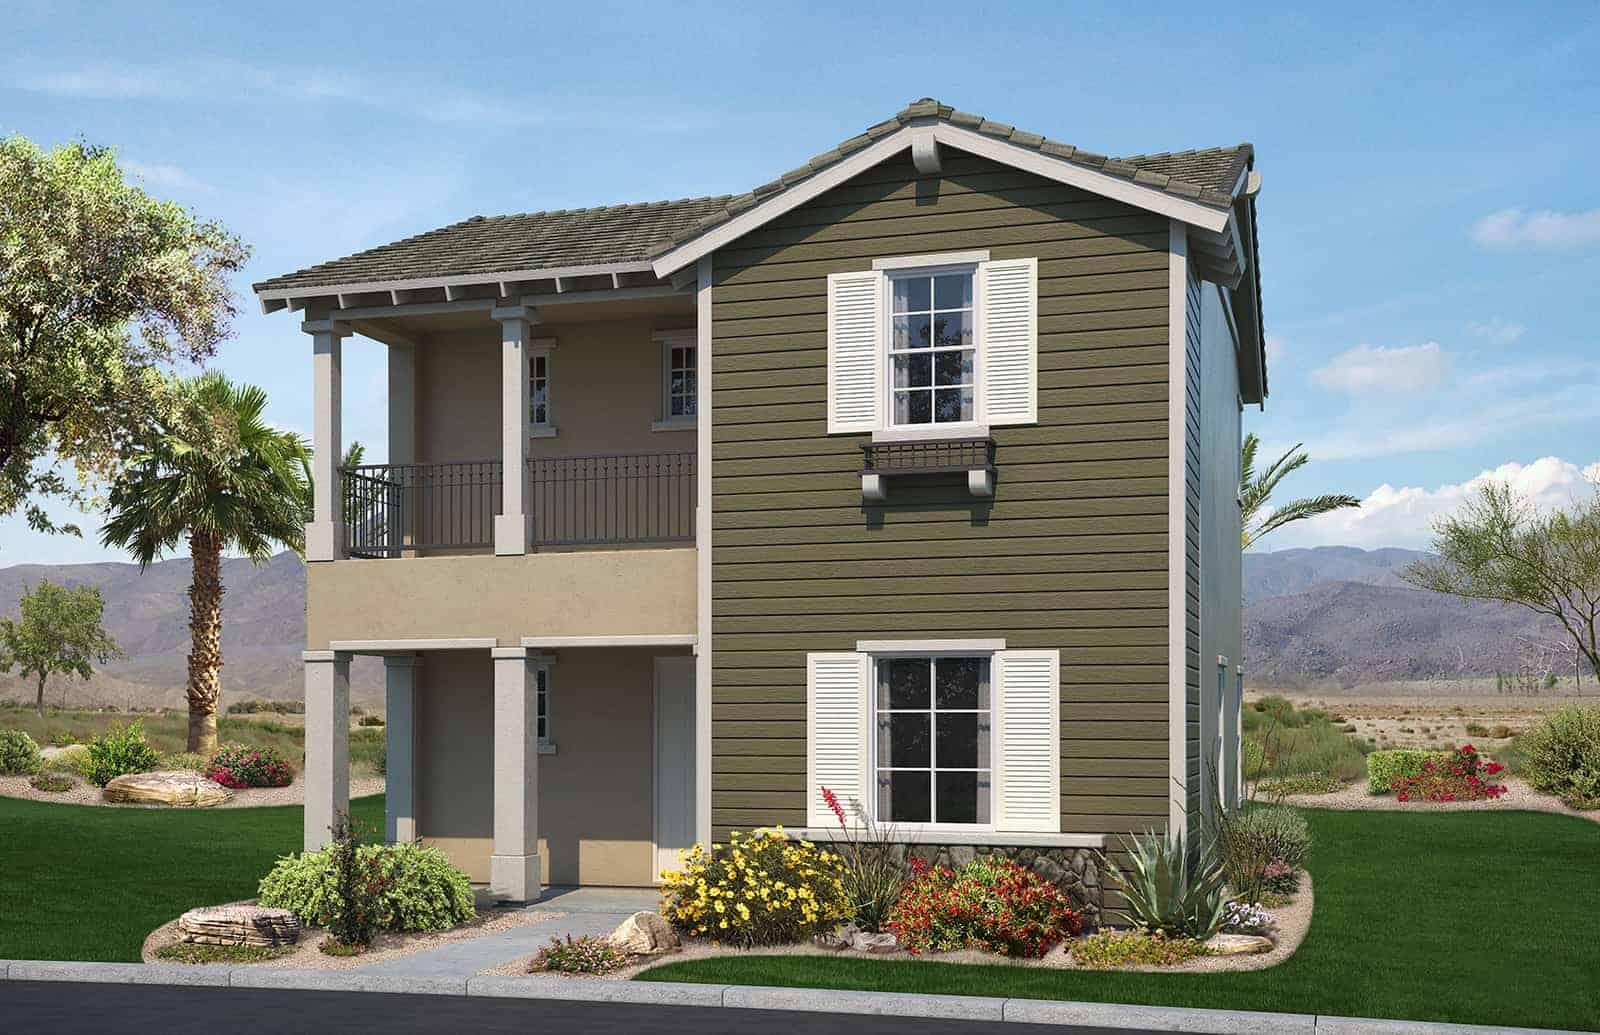 Cottages at Verrado   Residence 4   Plan C